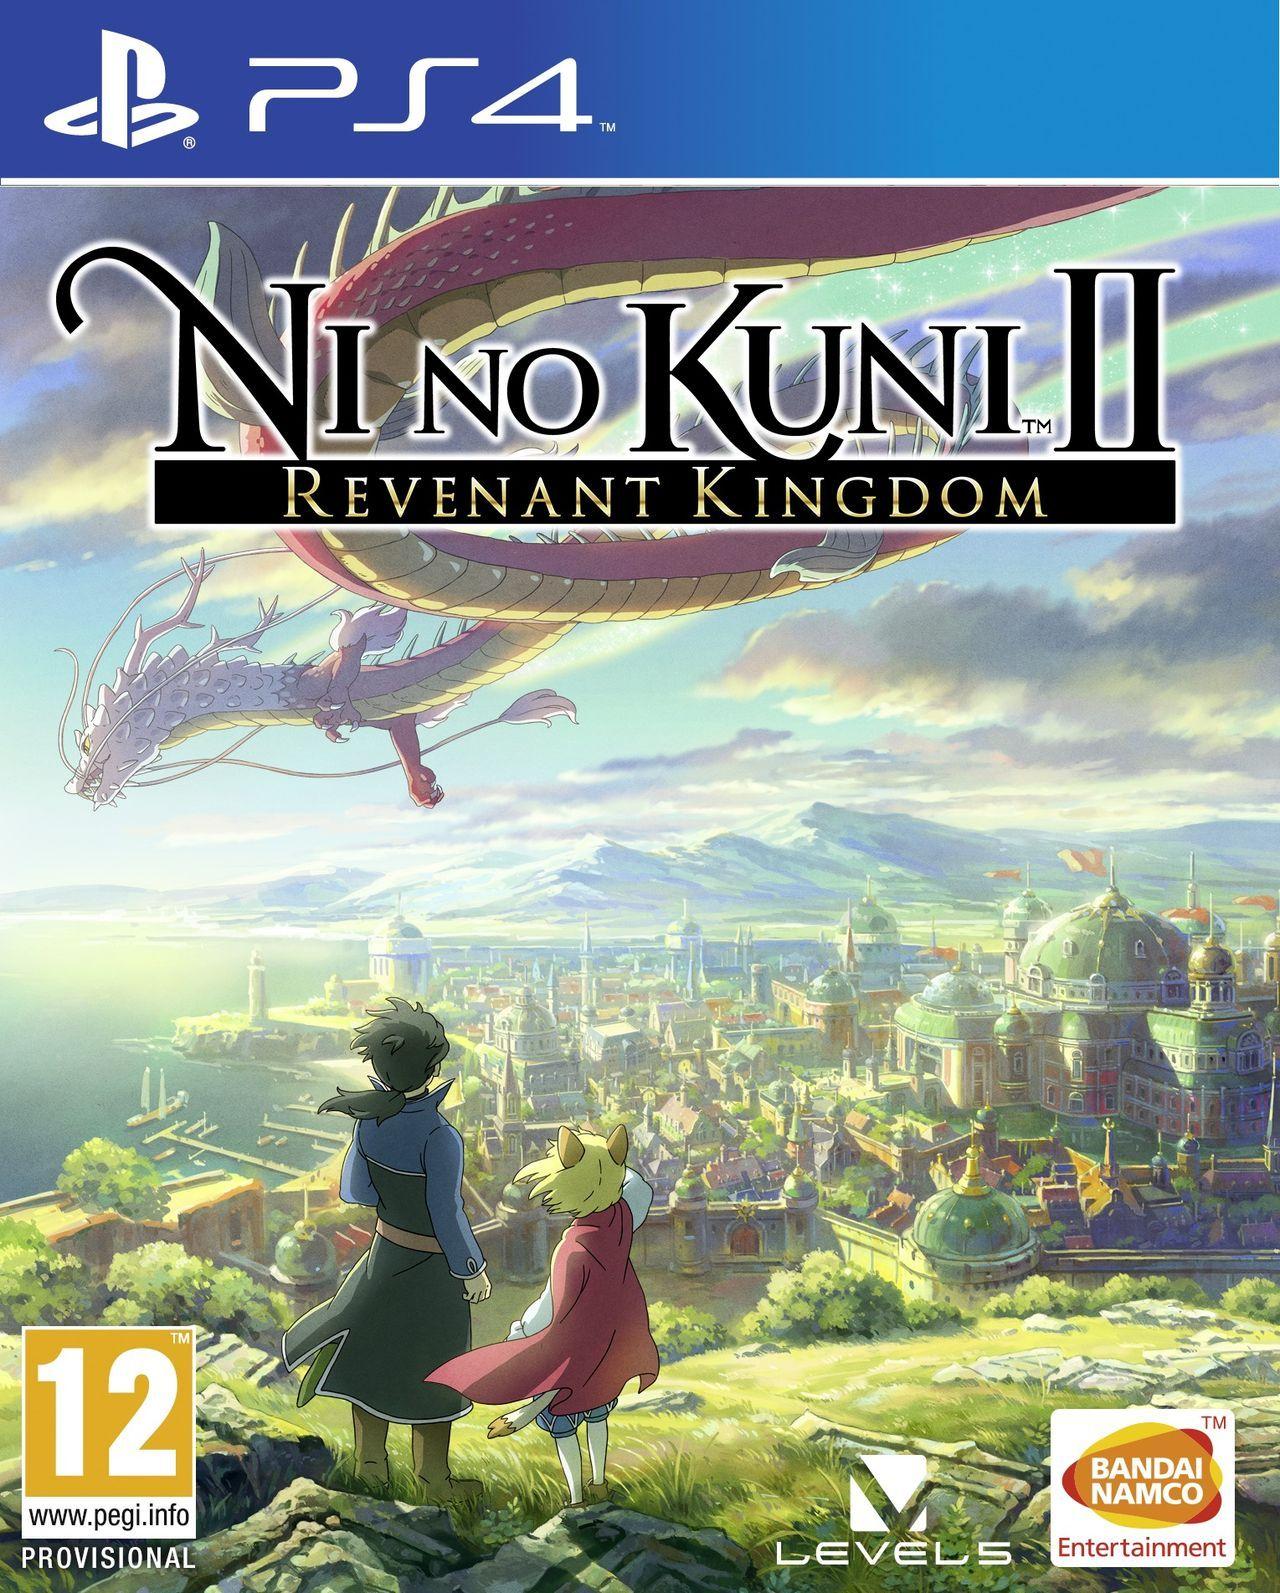 Ni no Kuni II: REVENANT KINGDOM - PS4 PSN Store brasileña